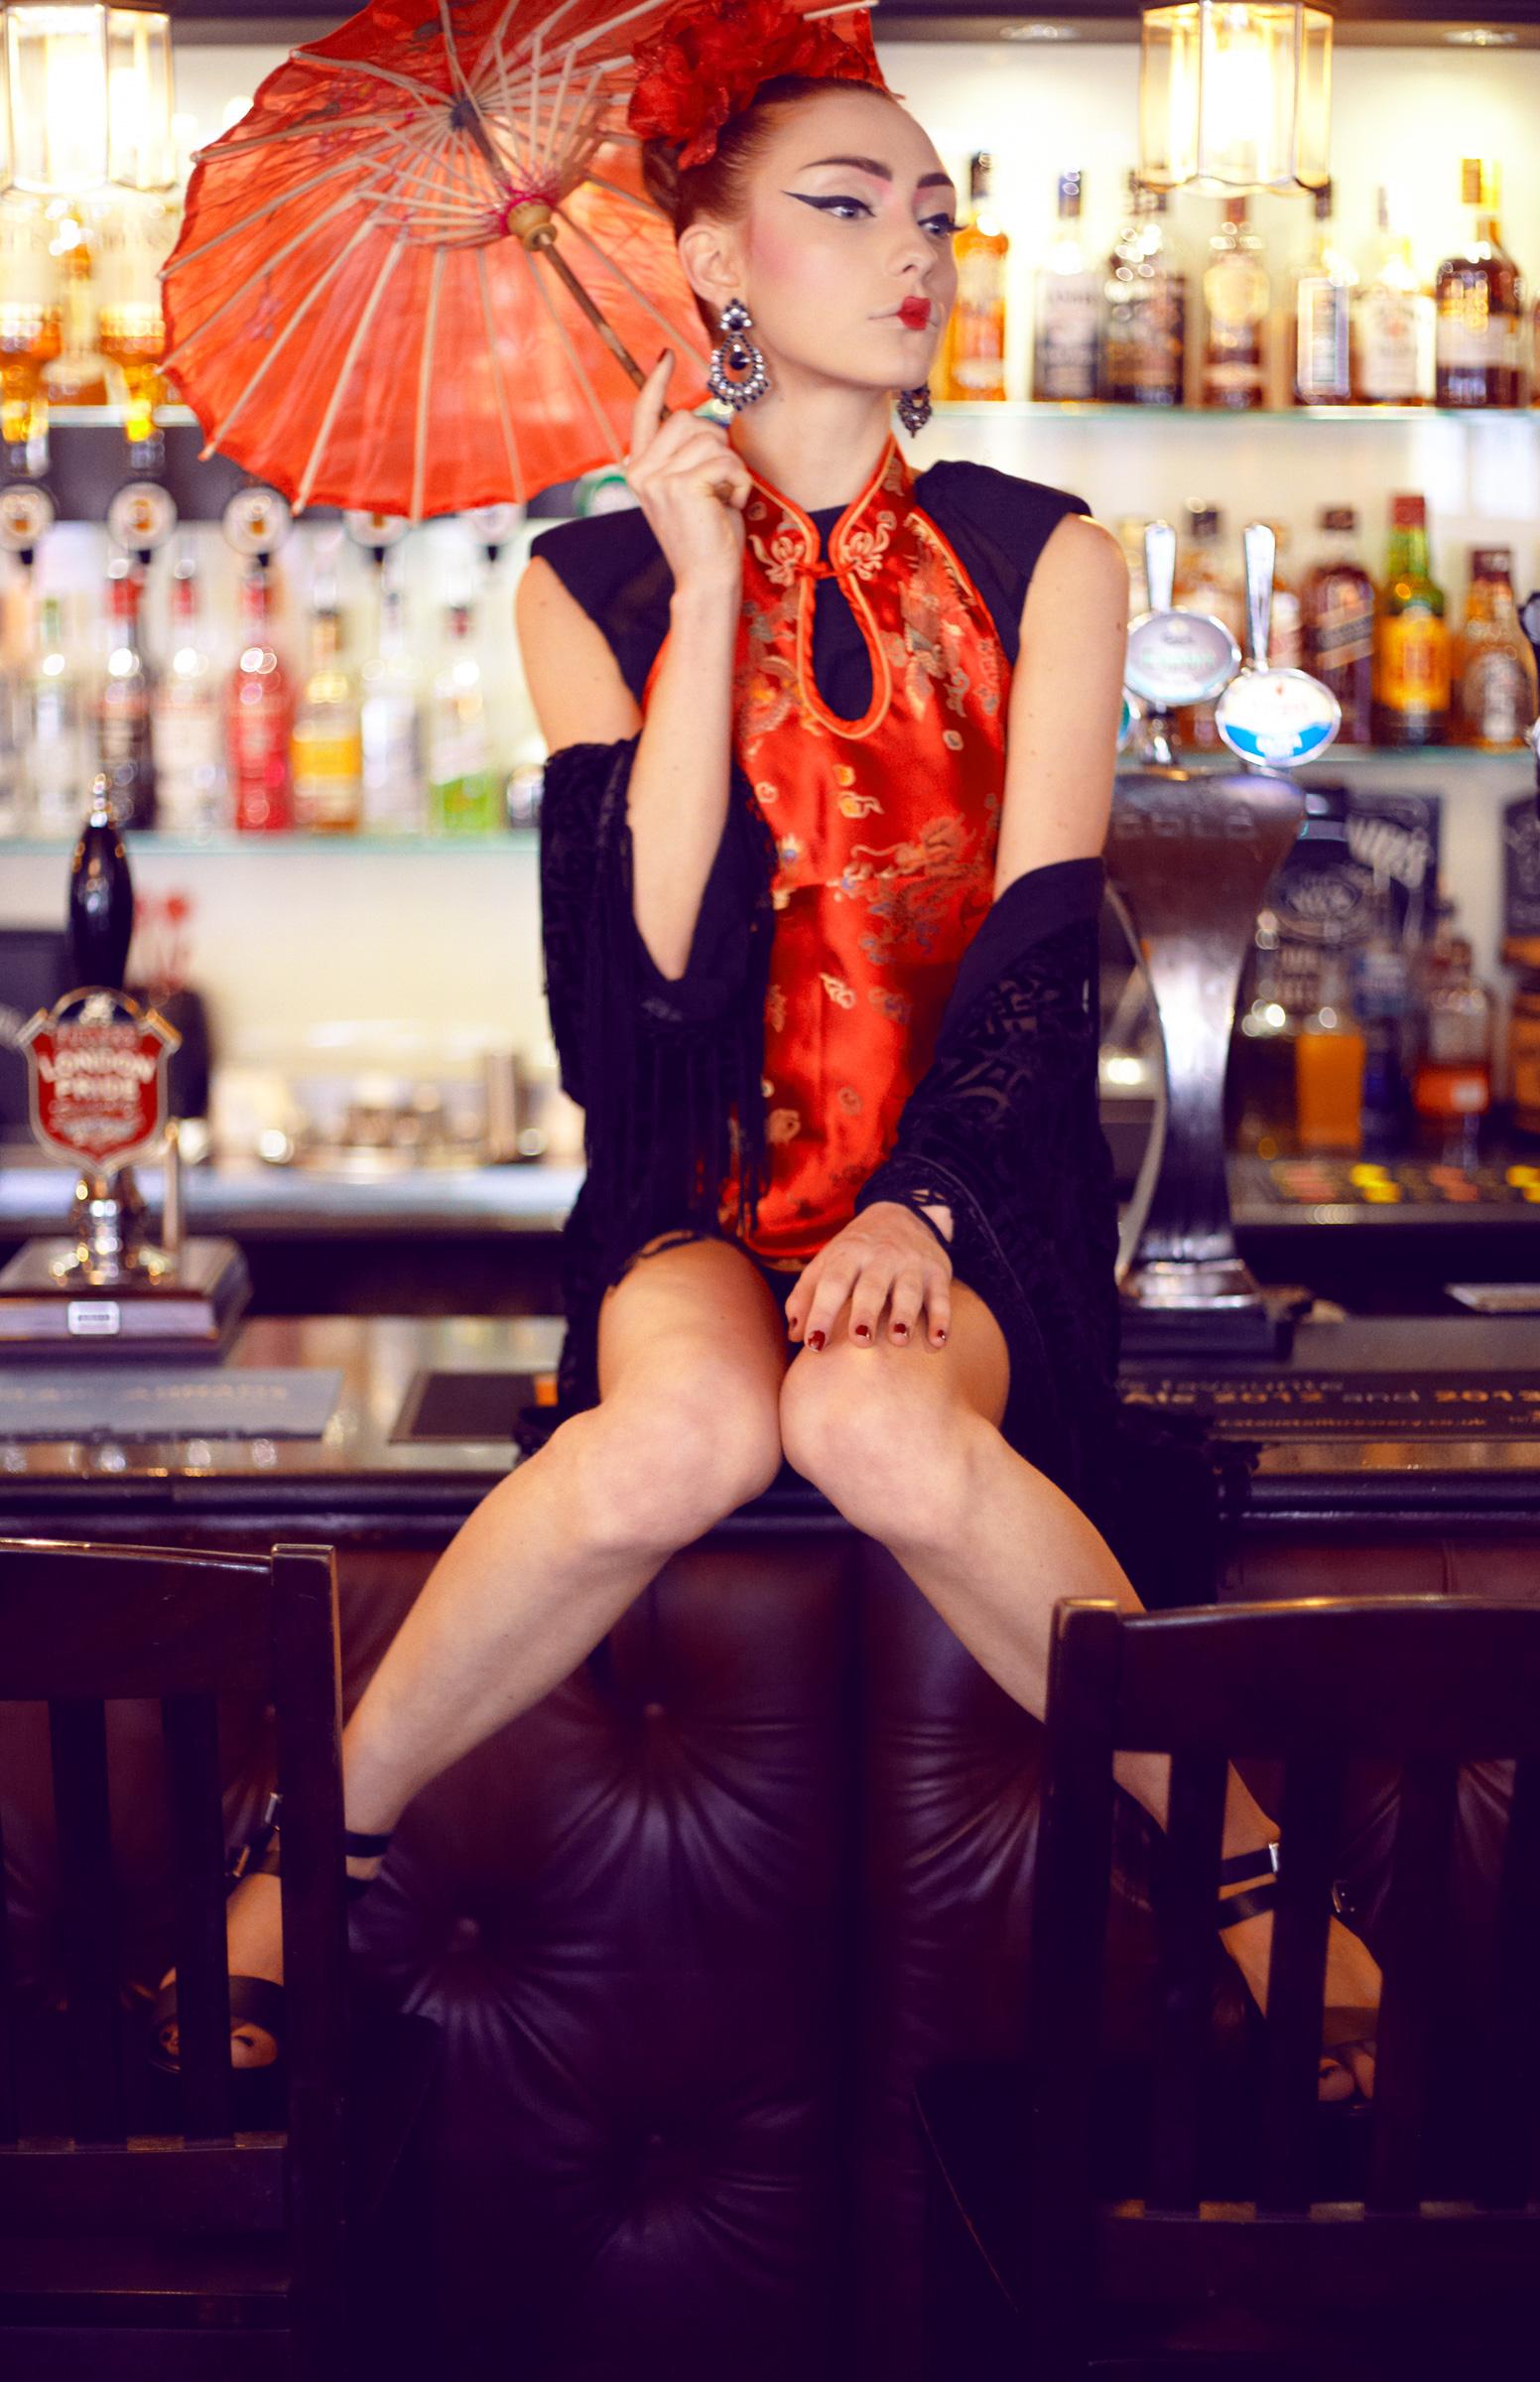 JC-GEISHA---RIO-DEBOLLA-Models1UK-Melissa-Uren-Photography-FEB-2014-LOOK-30624-FINAL-WEB-V2.jpg